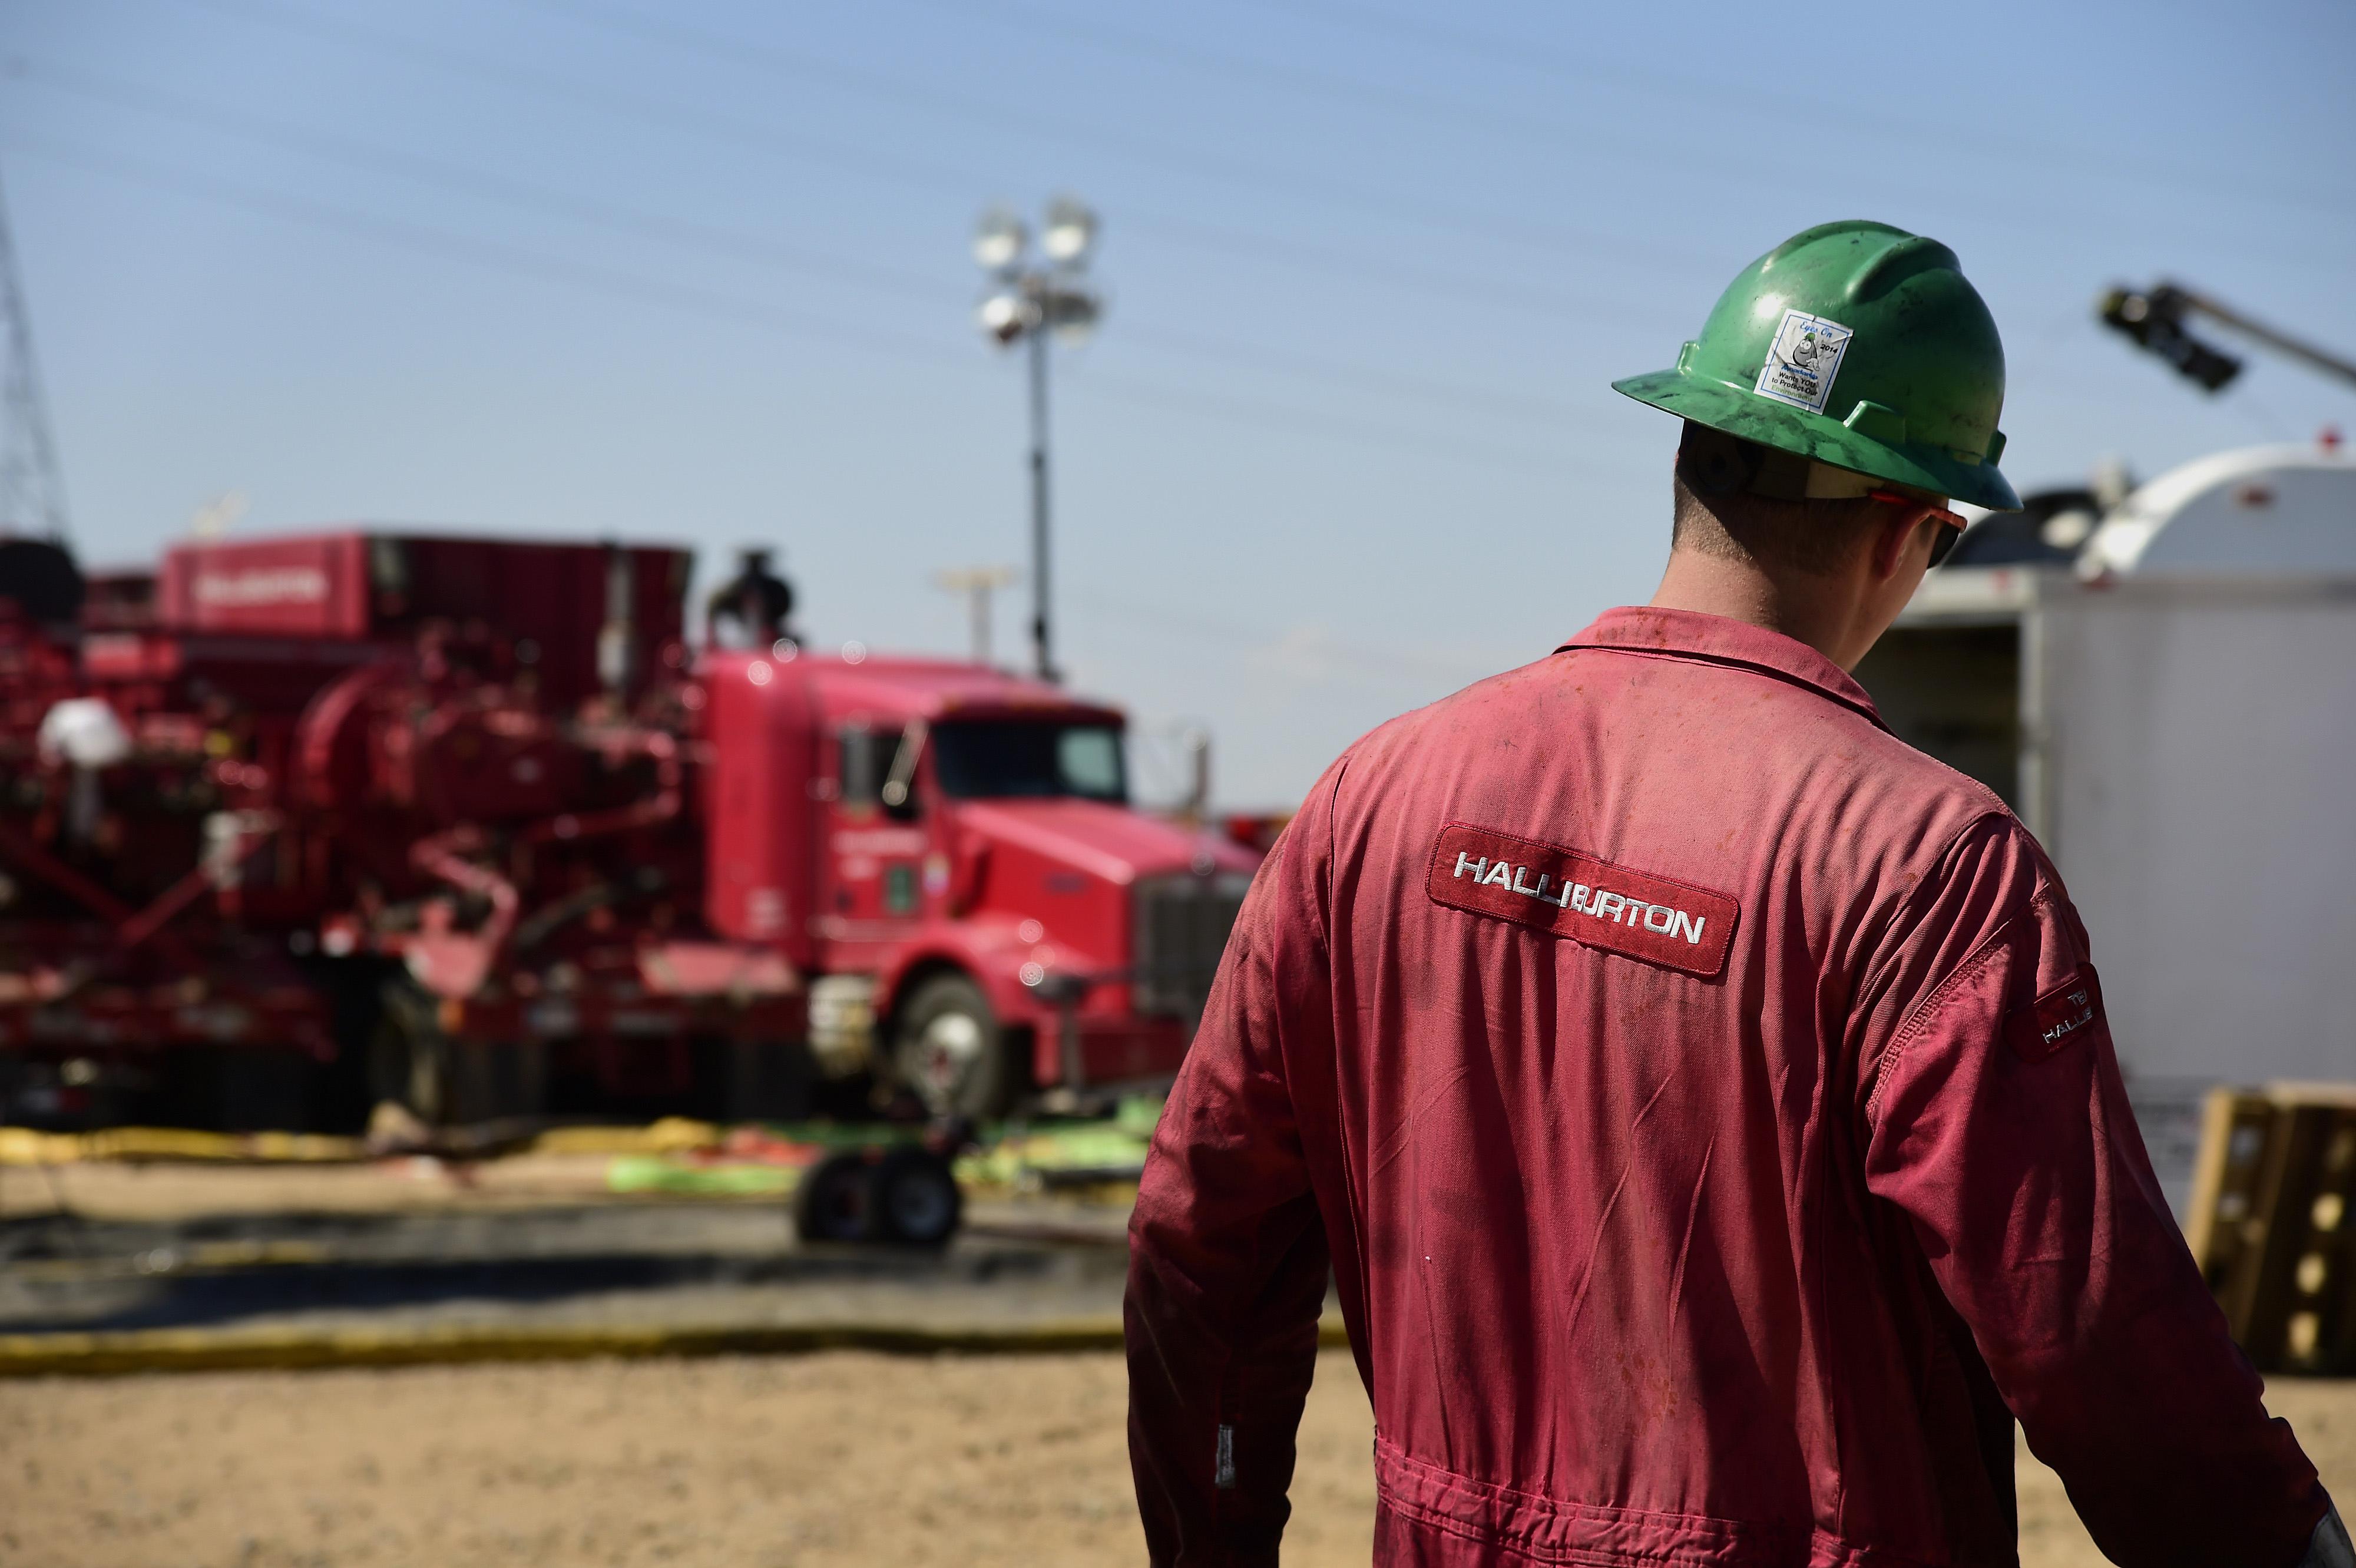 Tour Of An Anadarko Petroleum Corp. Rig Site As U.S Crude Inventories Rise